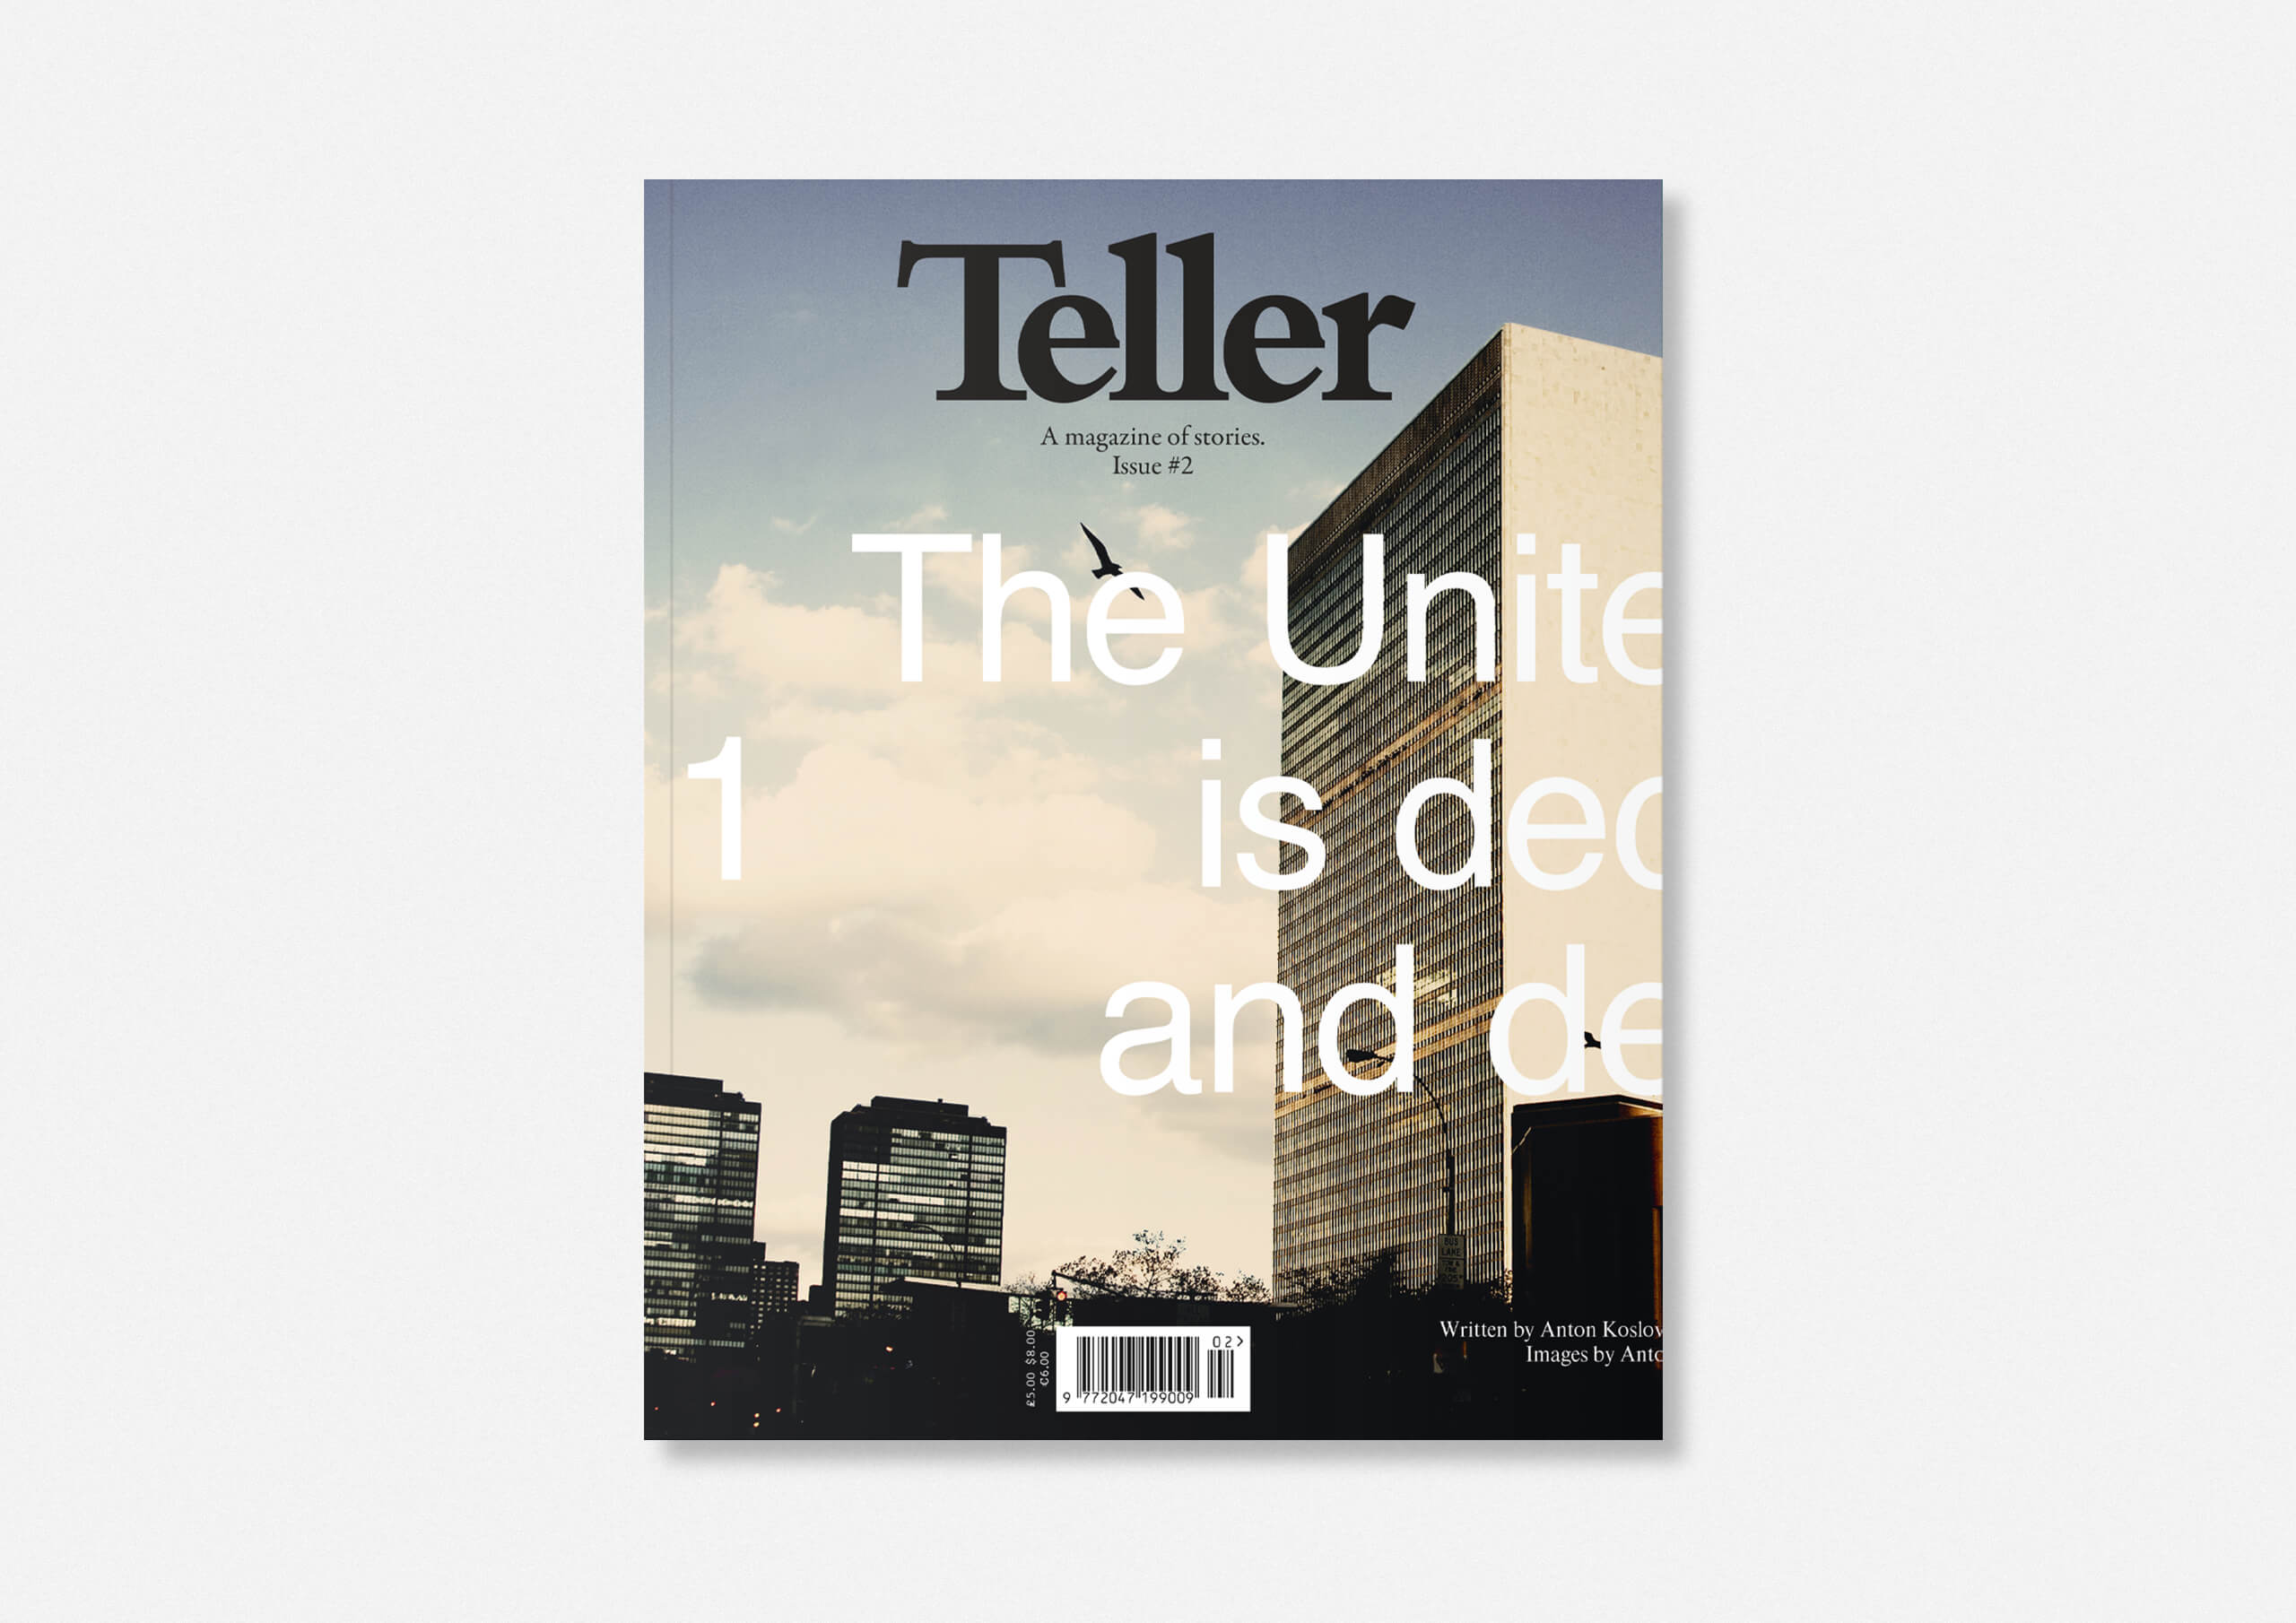 https://neuegestaltung.de/media/pages/clients/teller-magazine-issue-2/eb9707a5ee-1602773596/teller-magazin-issue-02-thumbnail.jpg